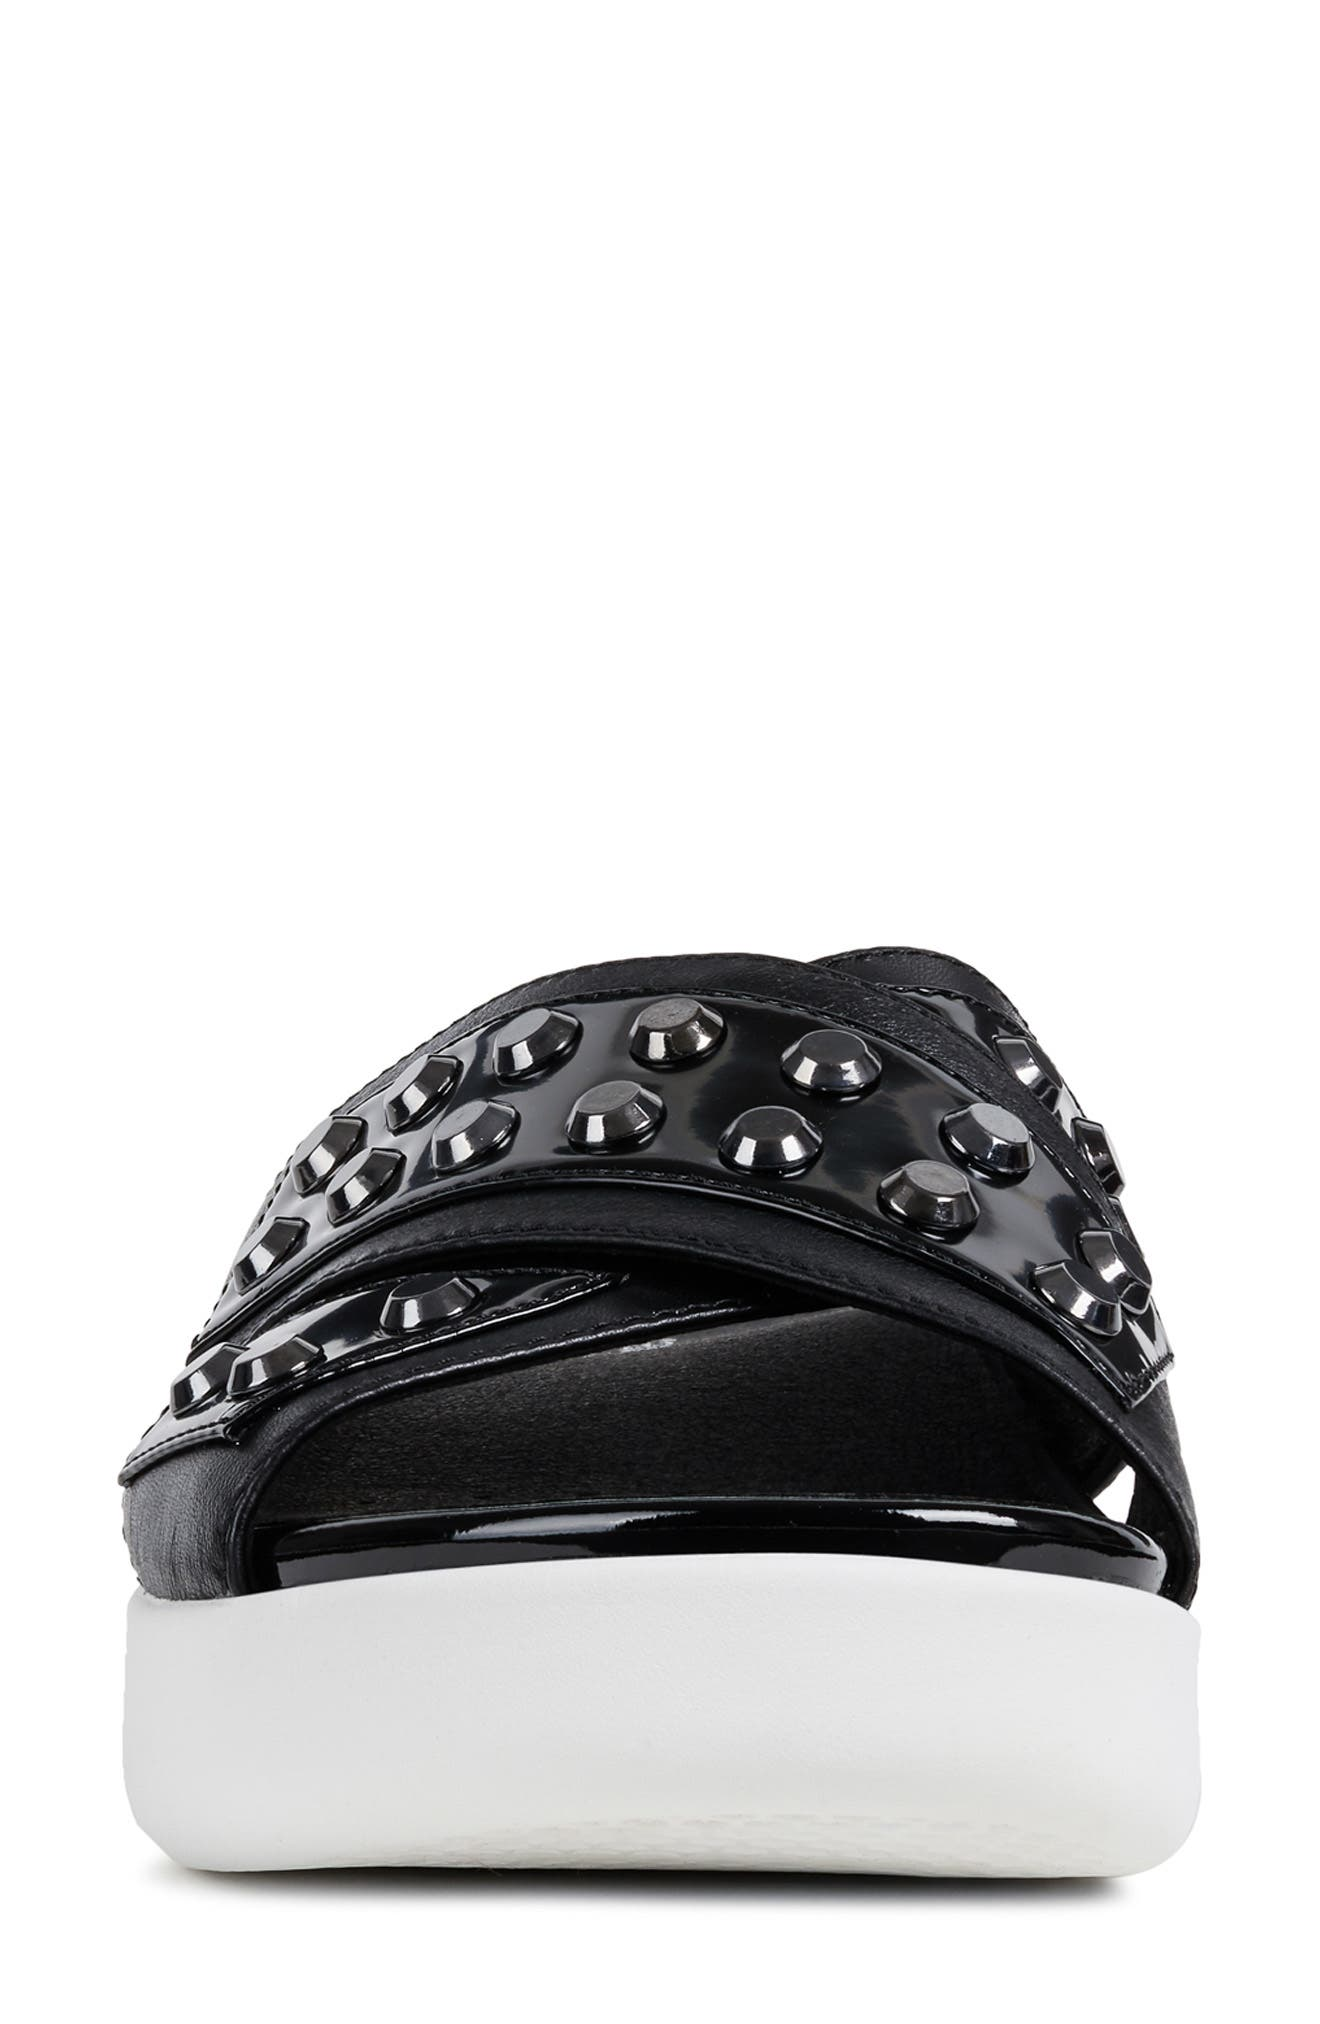 GEOX, Ottaya Studded Slide Sandal, Alternate thumbnail 4, color, BLACK LEATHER